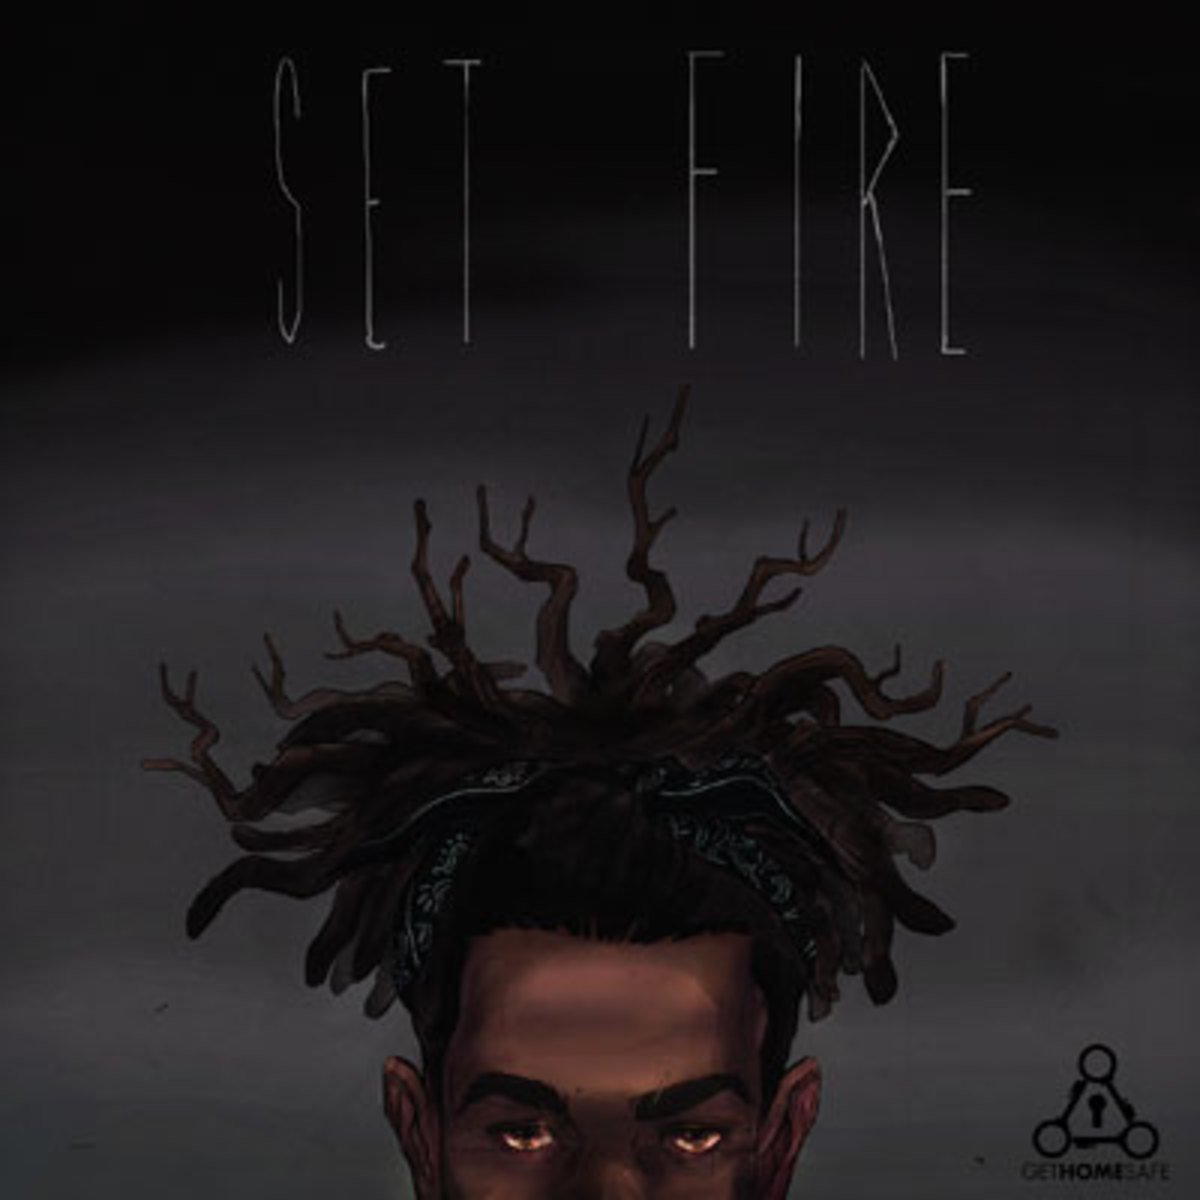 jazzcartier-setfire.jpg